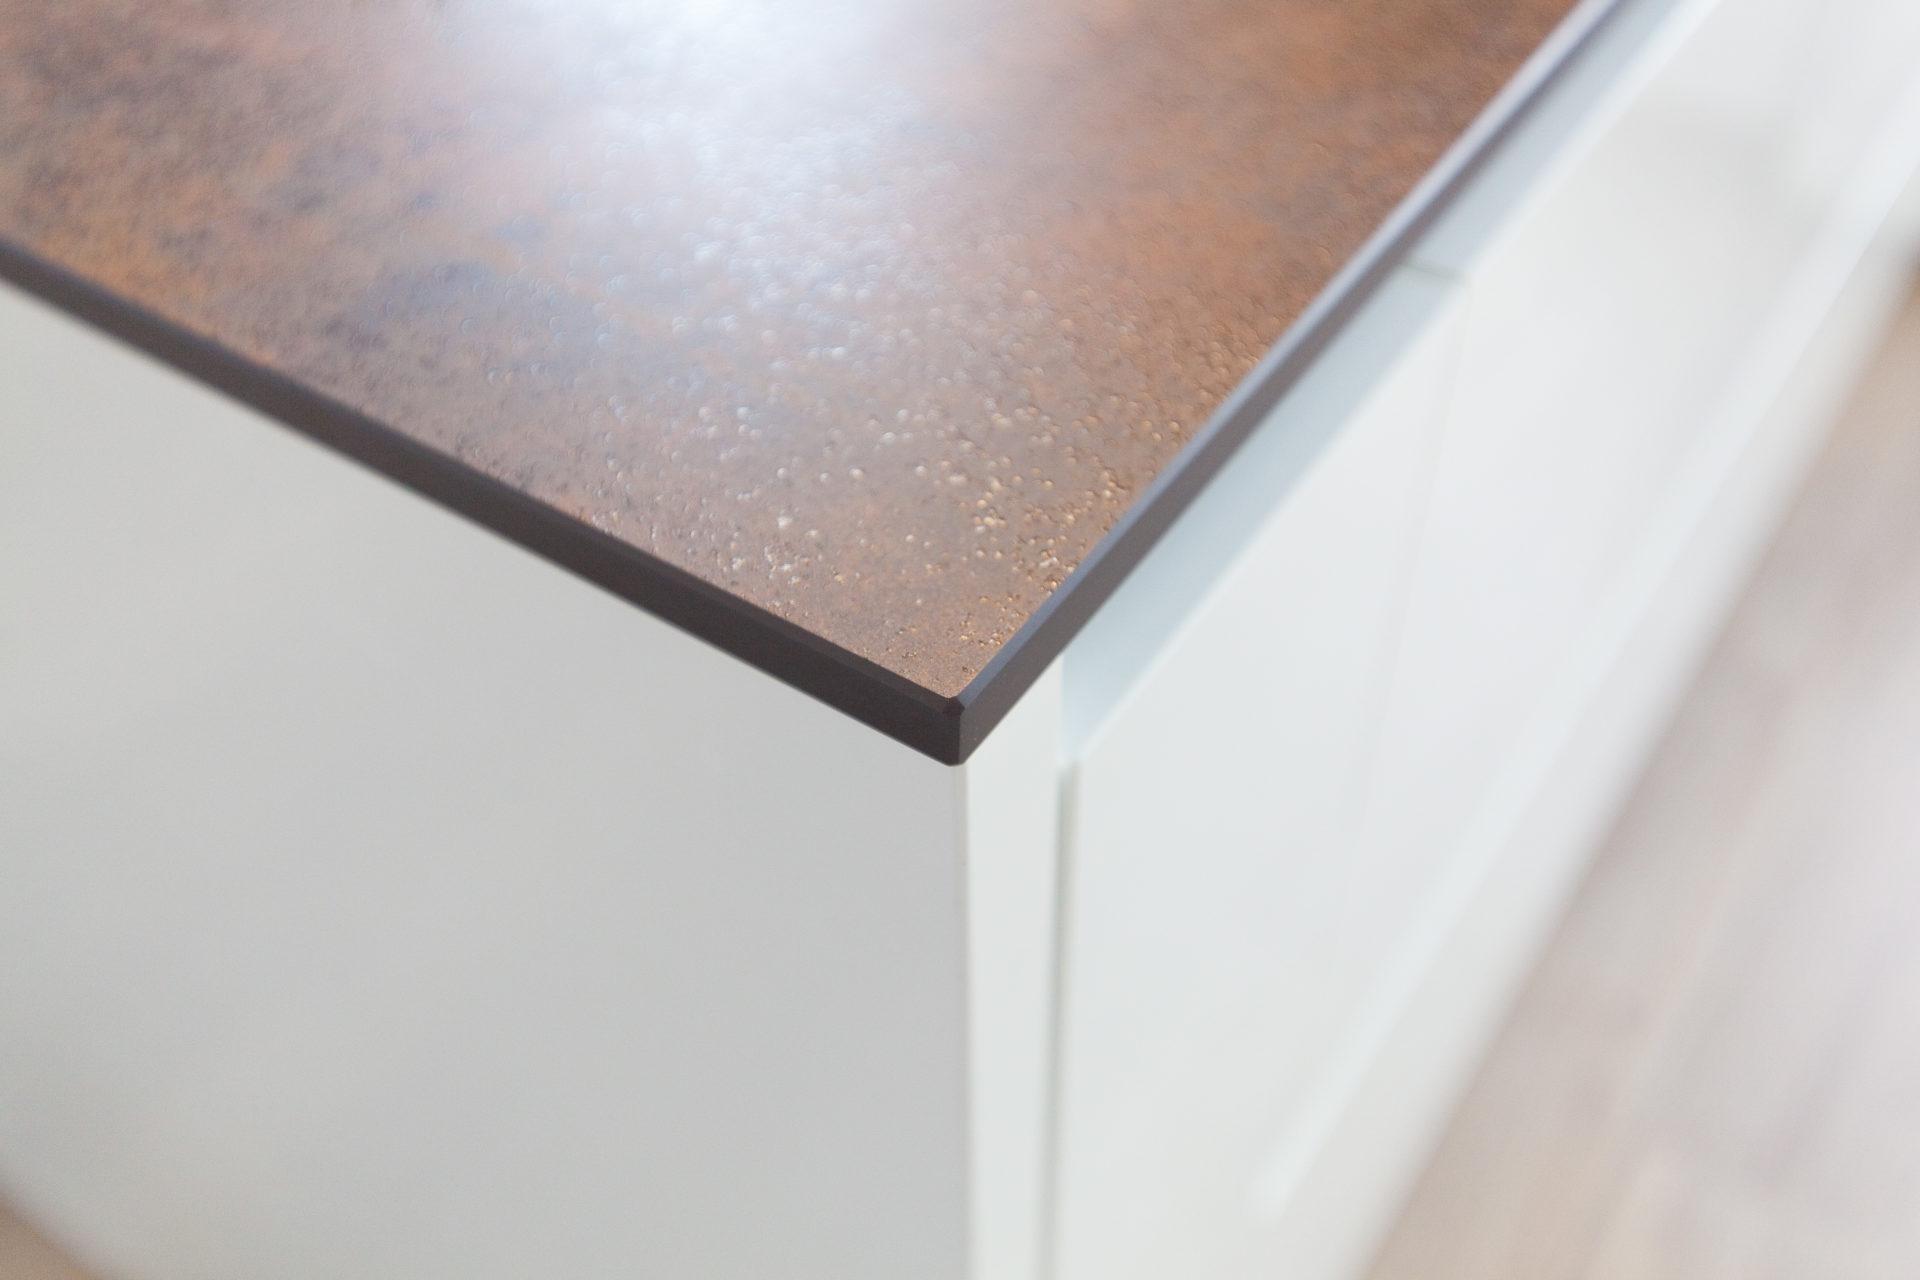 Kueche Overath Weiss Granit Modern Grifflos Bora Miele 046